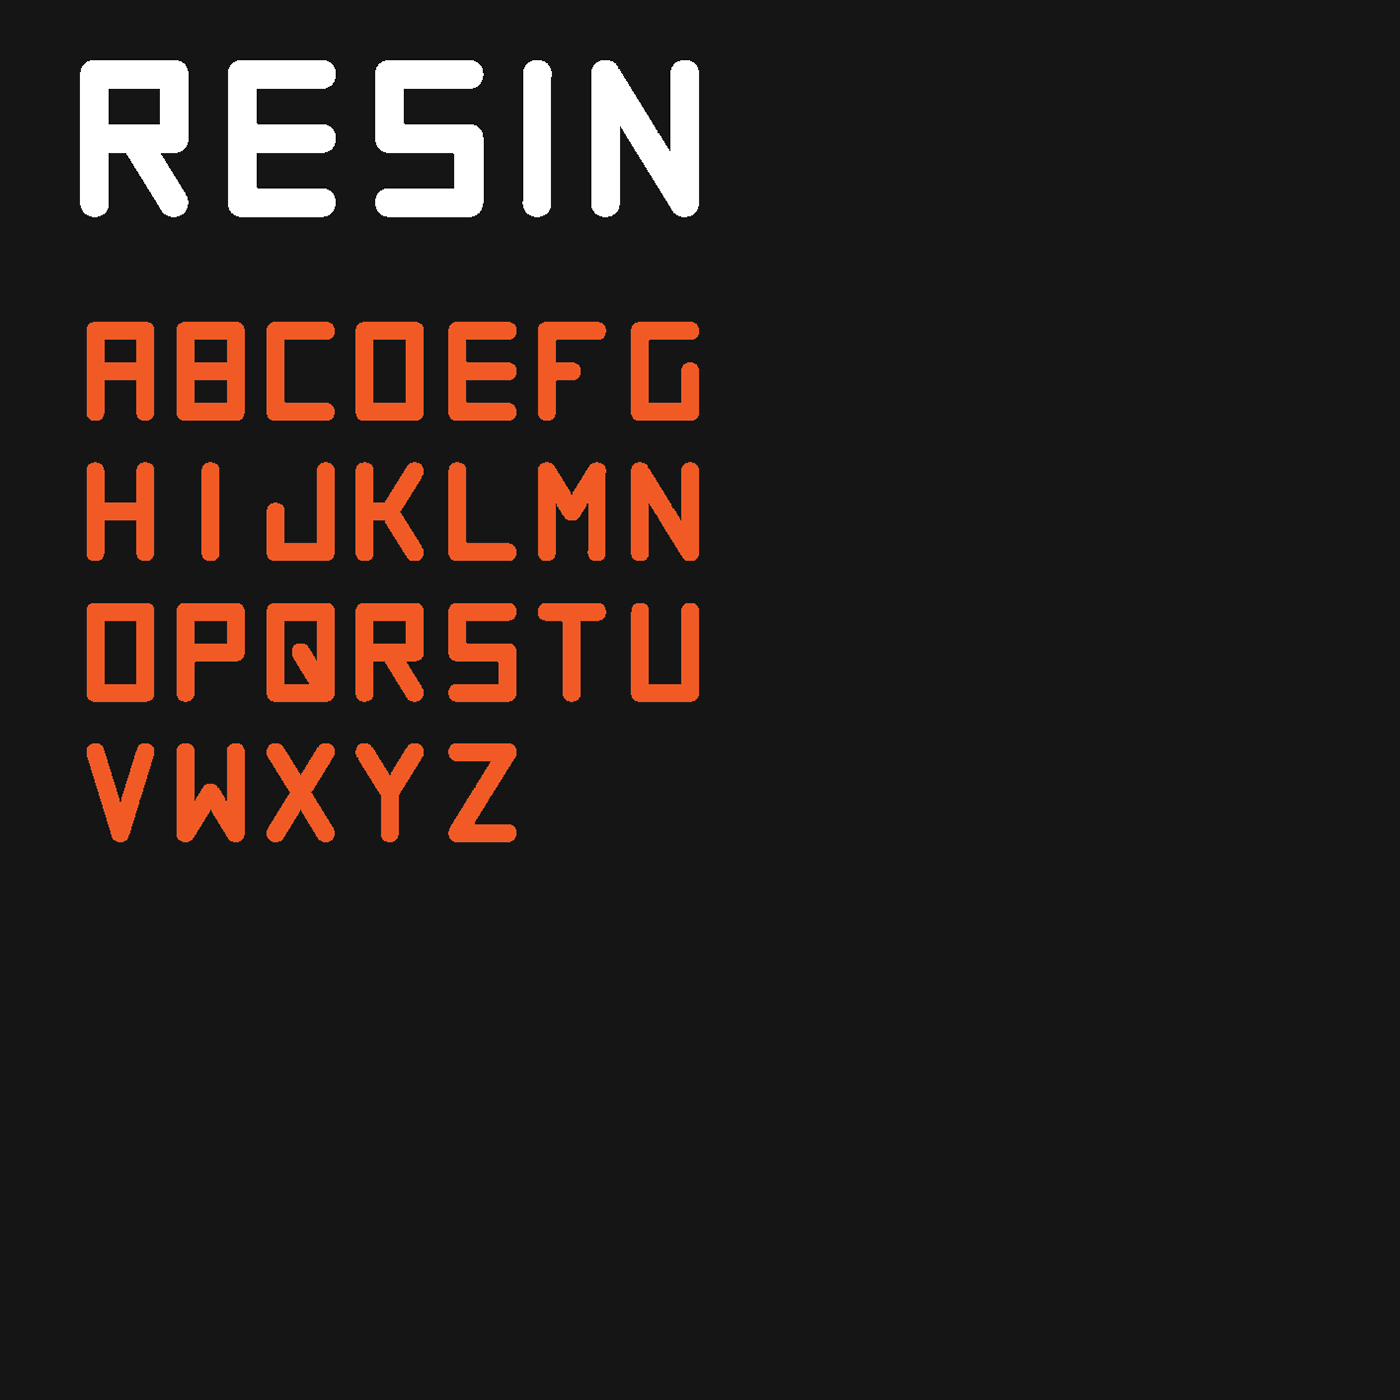 RESIN Free Font - sans-serif